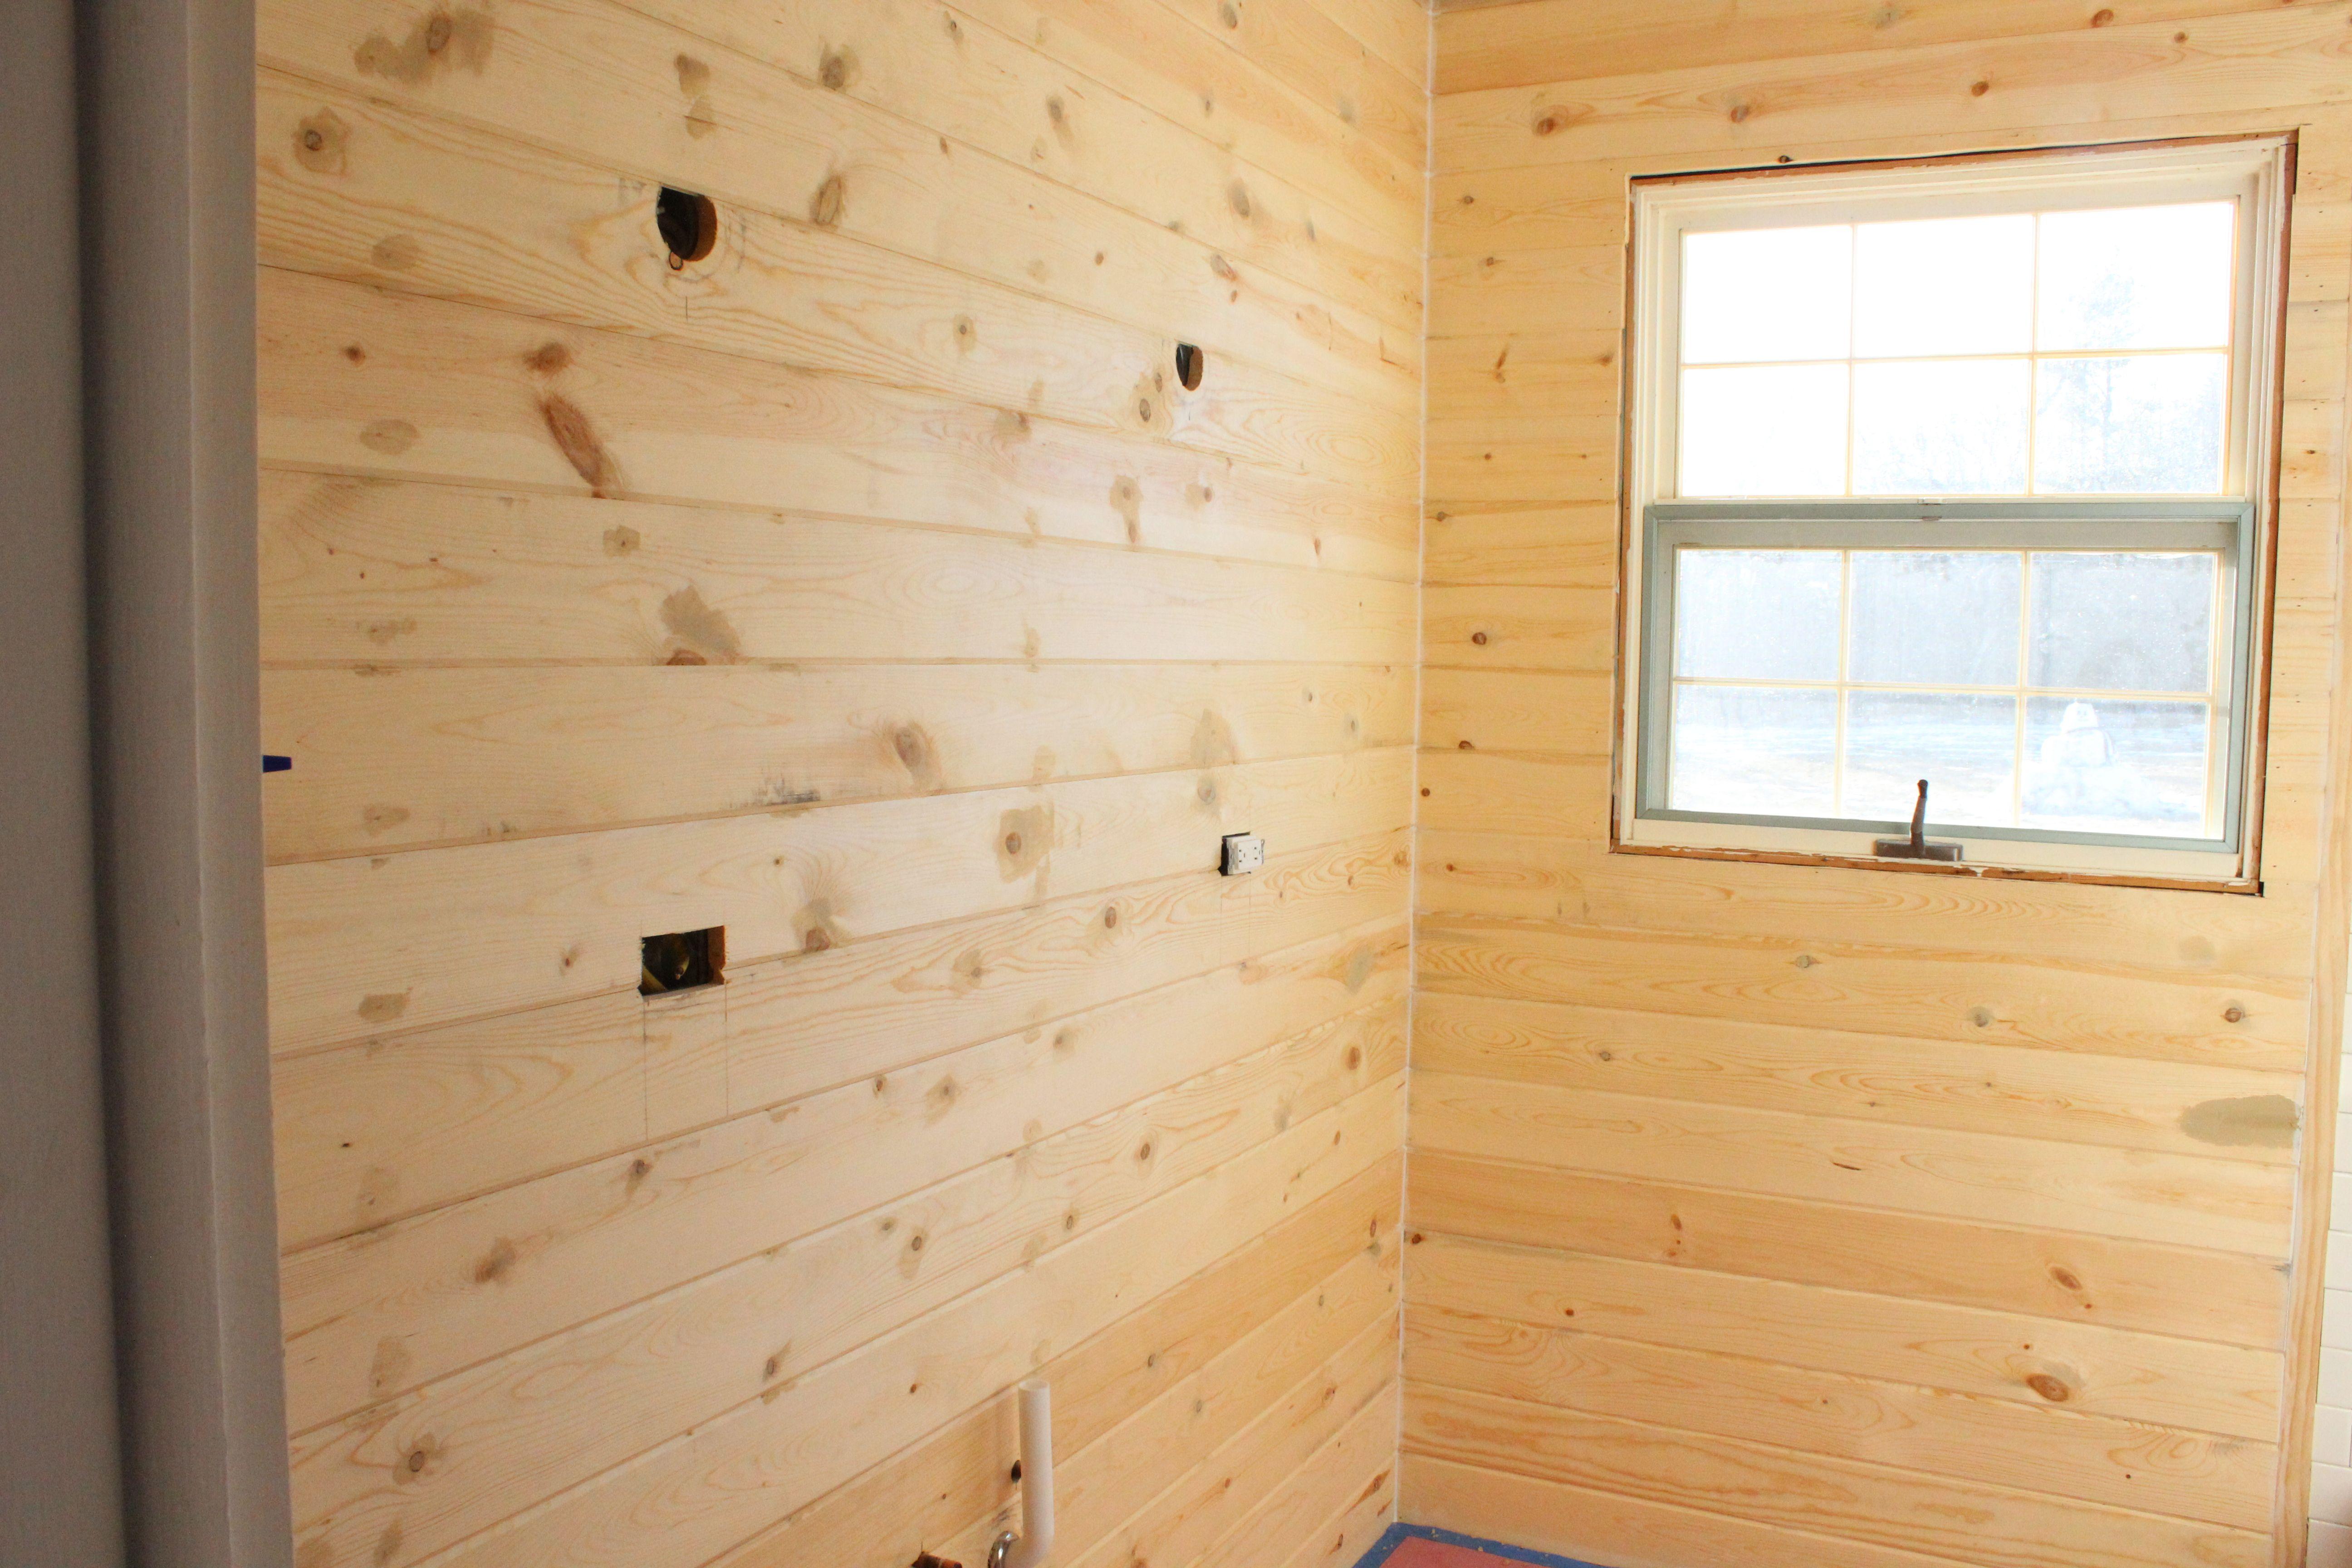 Operation New Bathroom Part Ii Home Gym Design Bathrooms Remodel Interior Wall Design